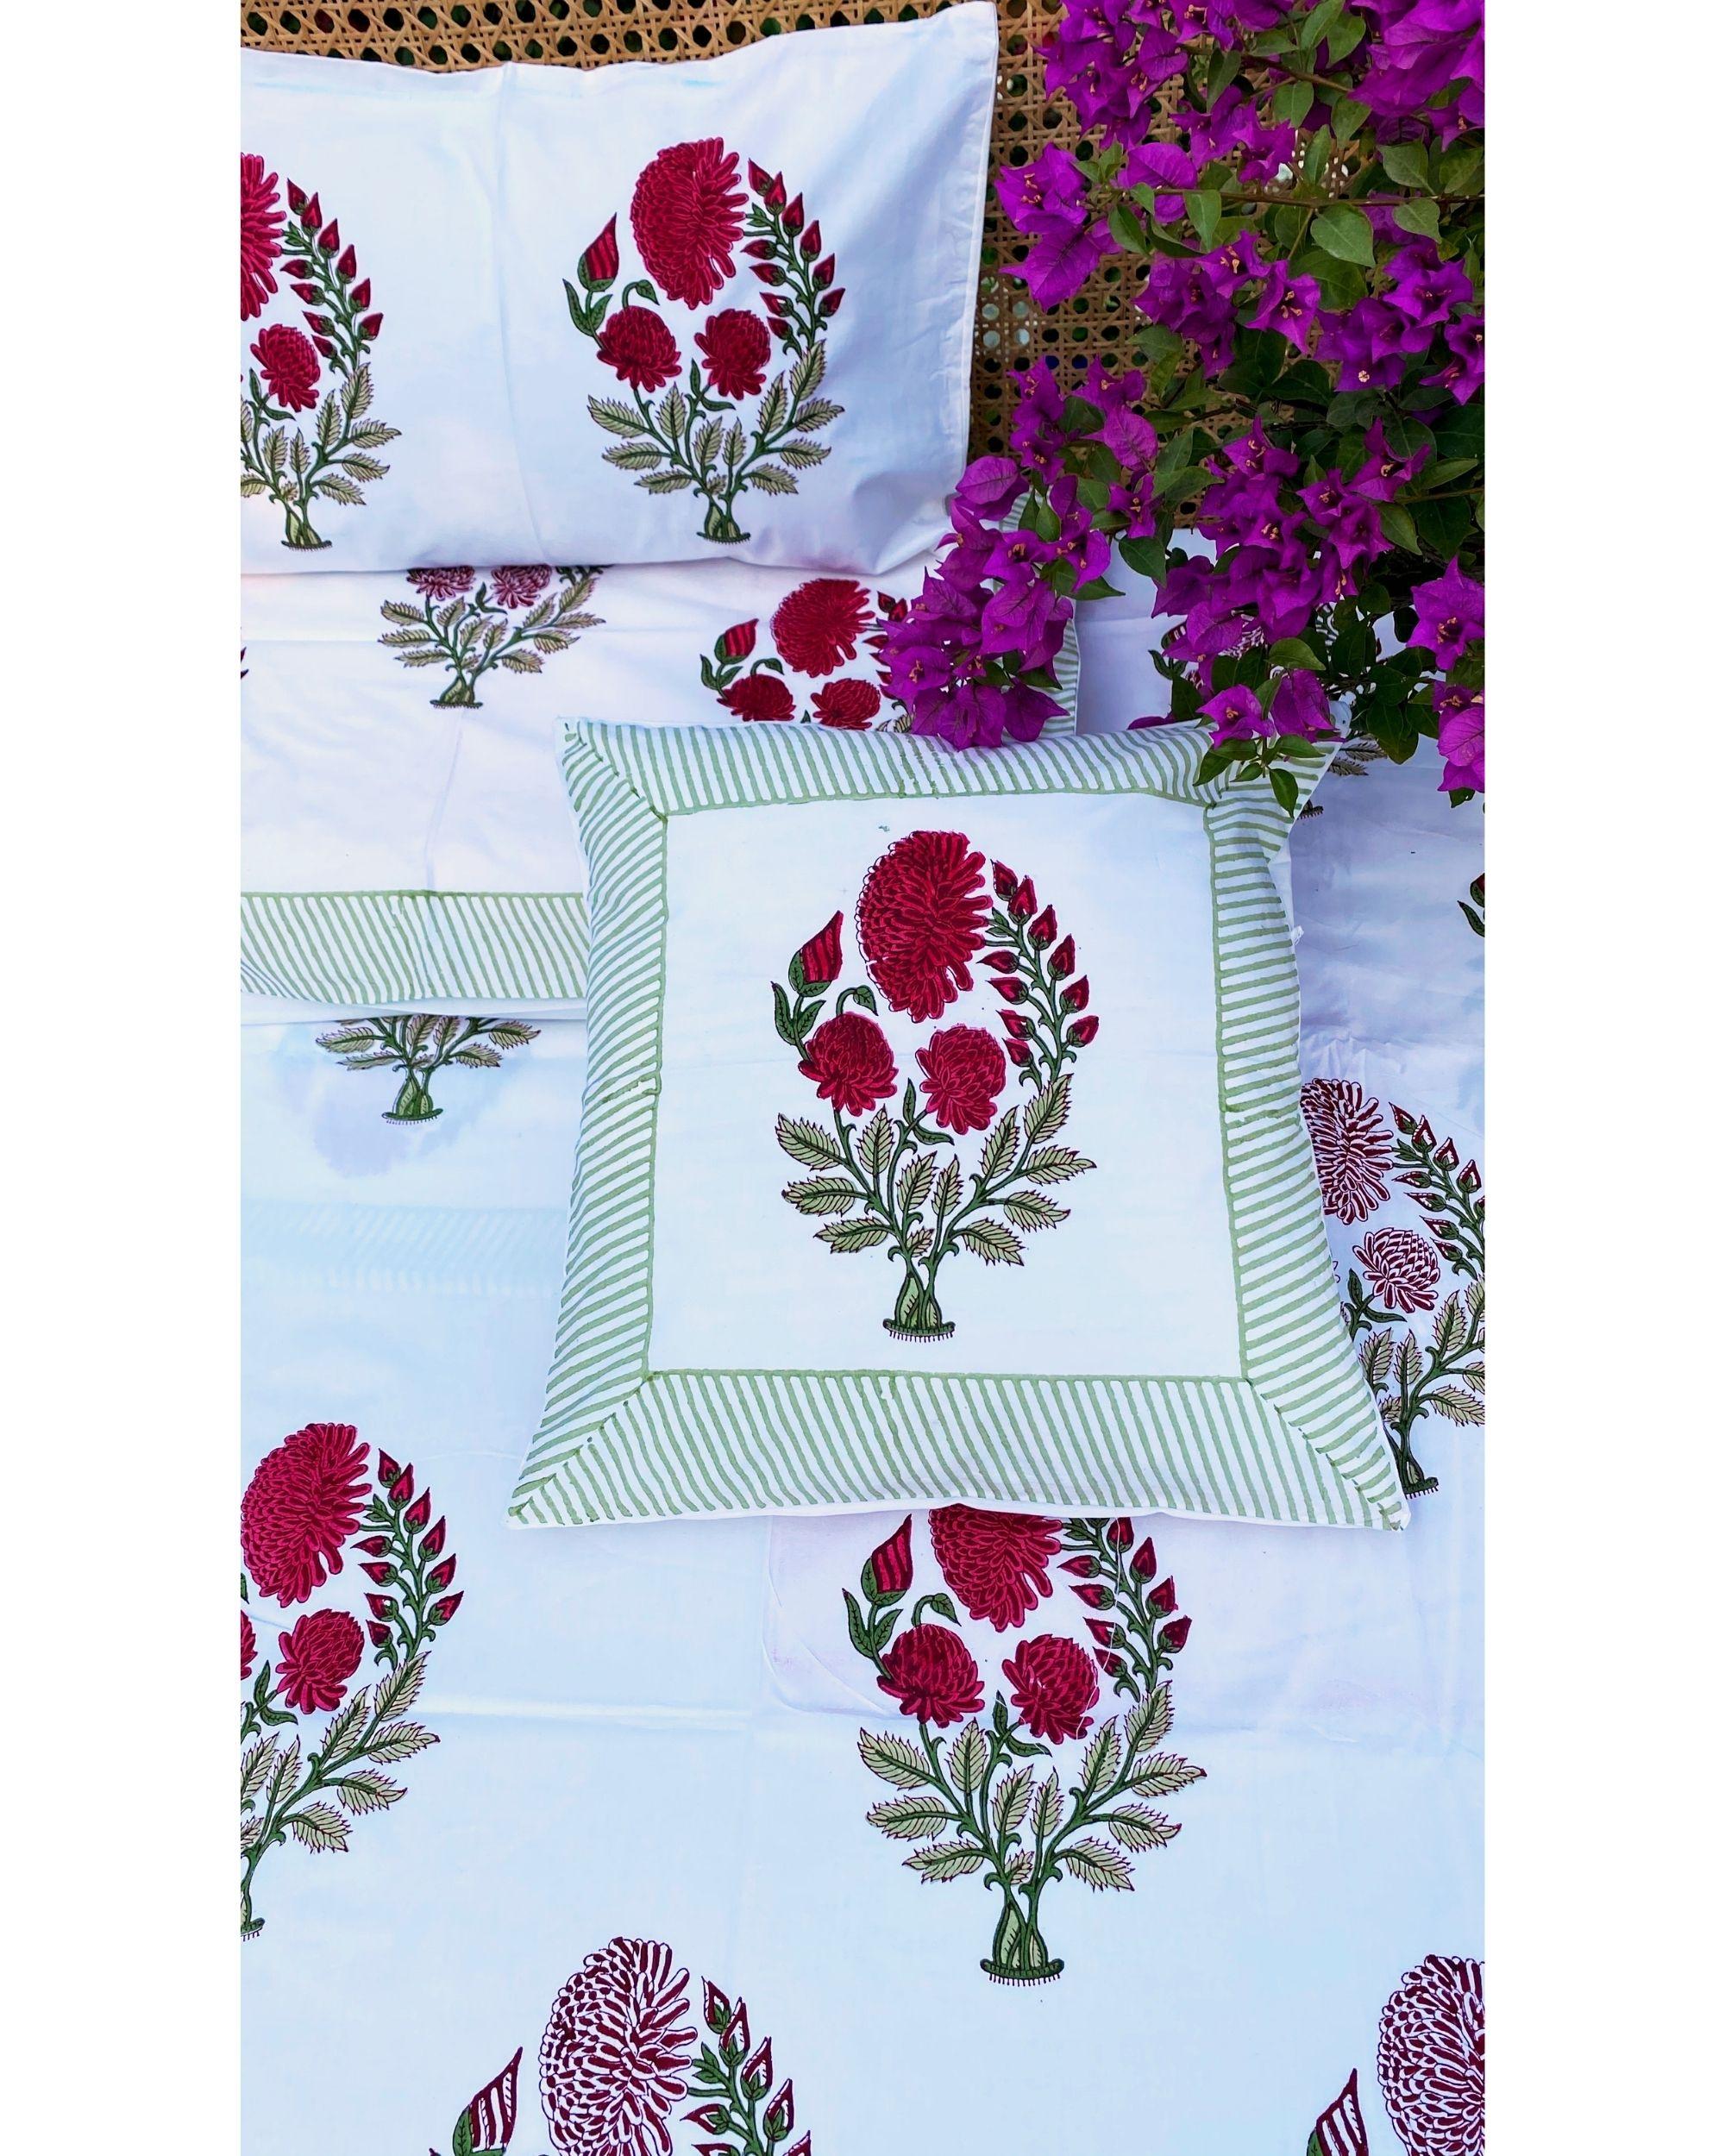 Rani pink mughal square and lumbar cushion covers - set of 4